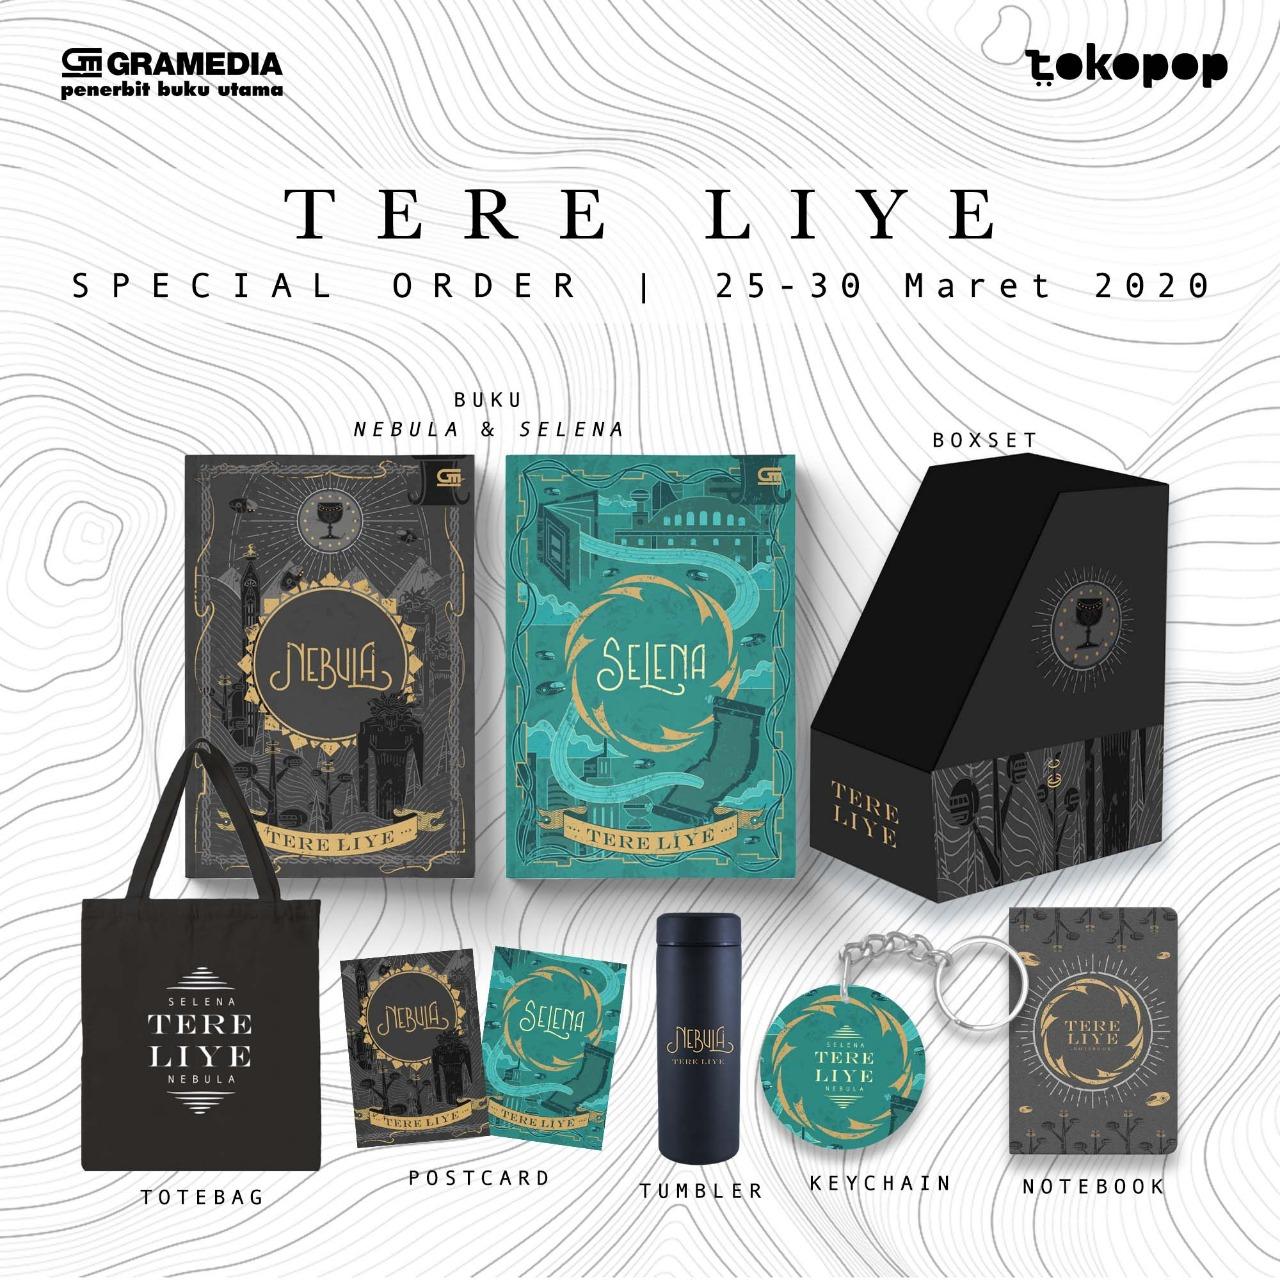 Special Order Tere Liye